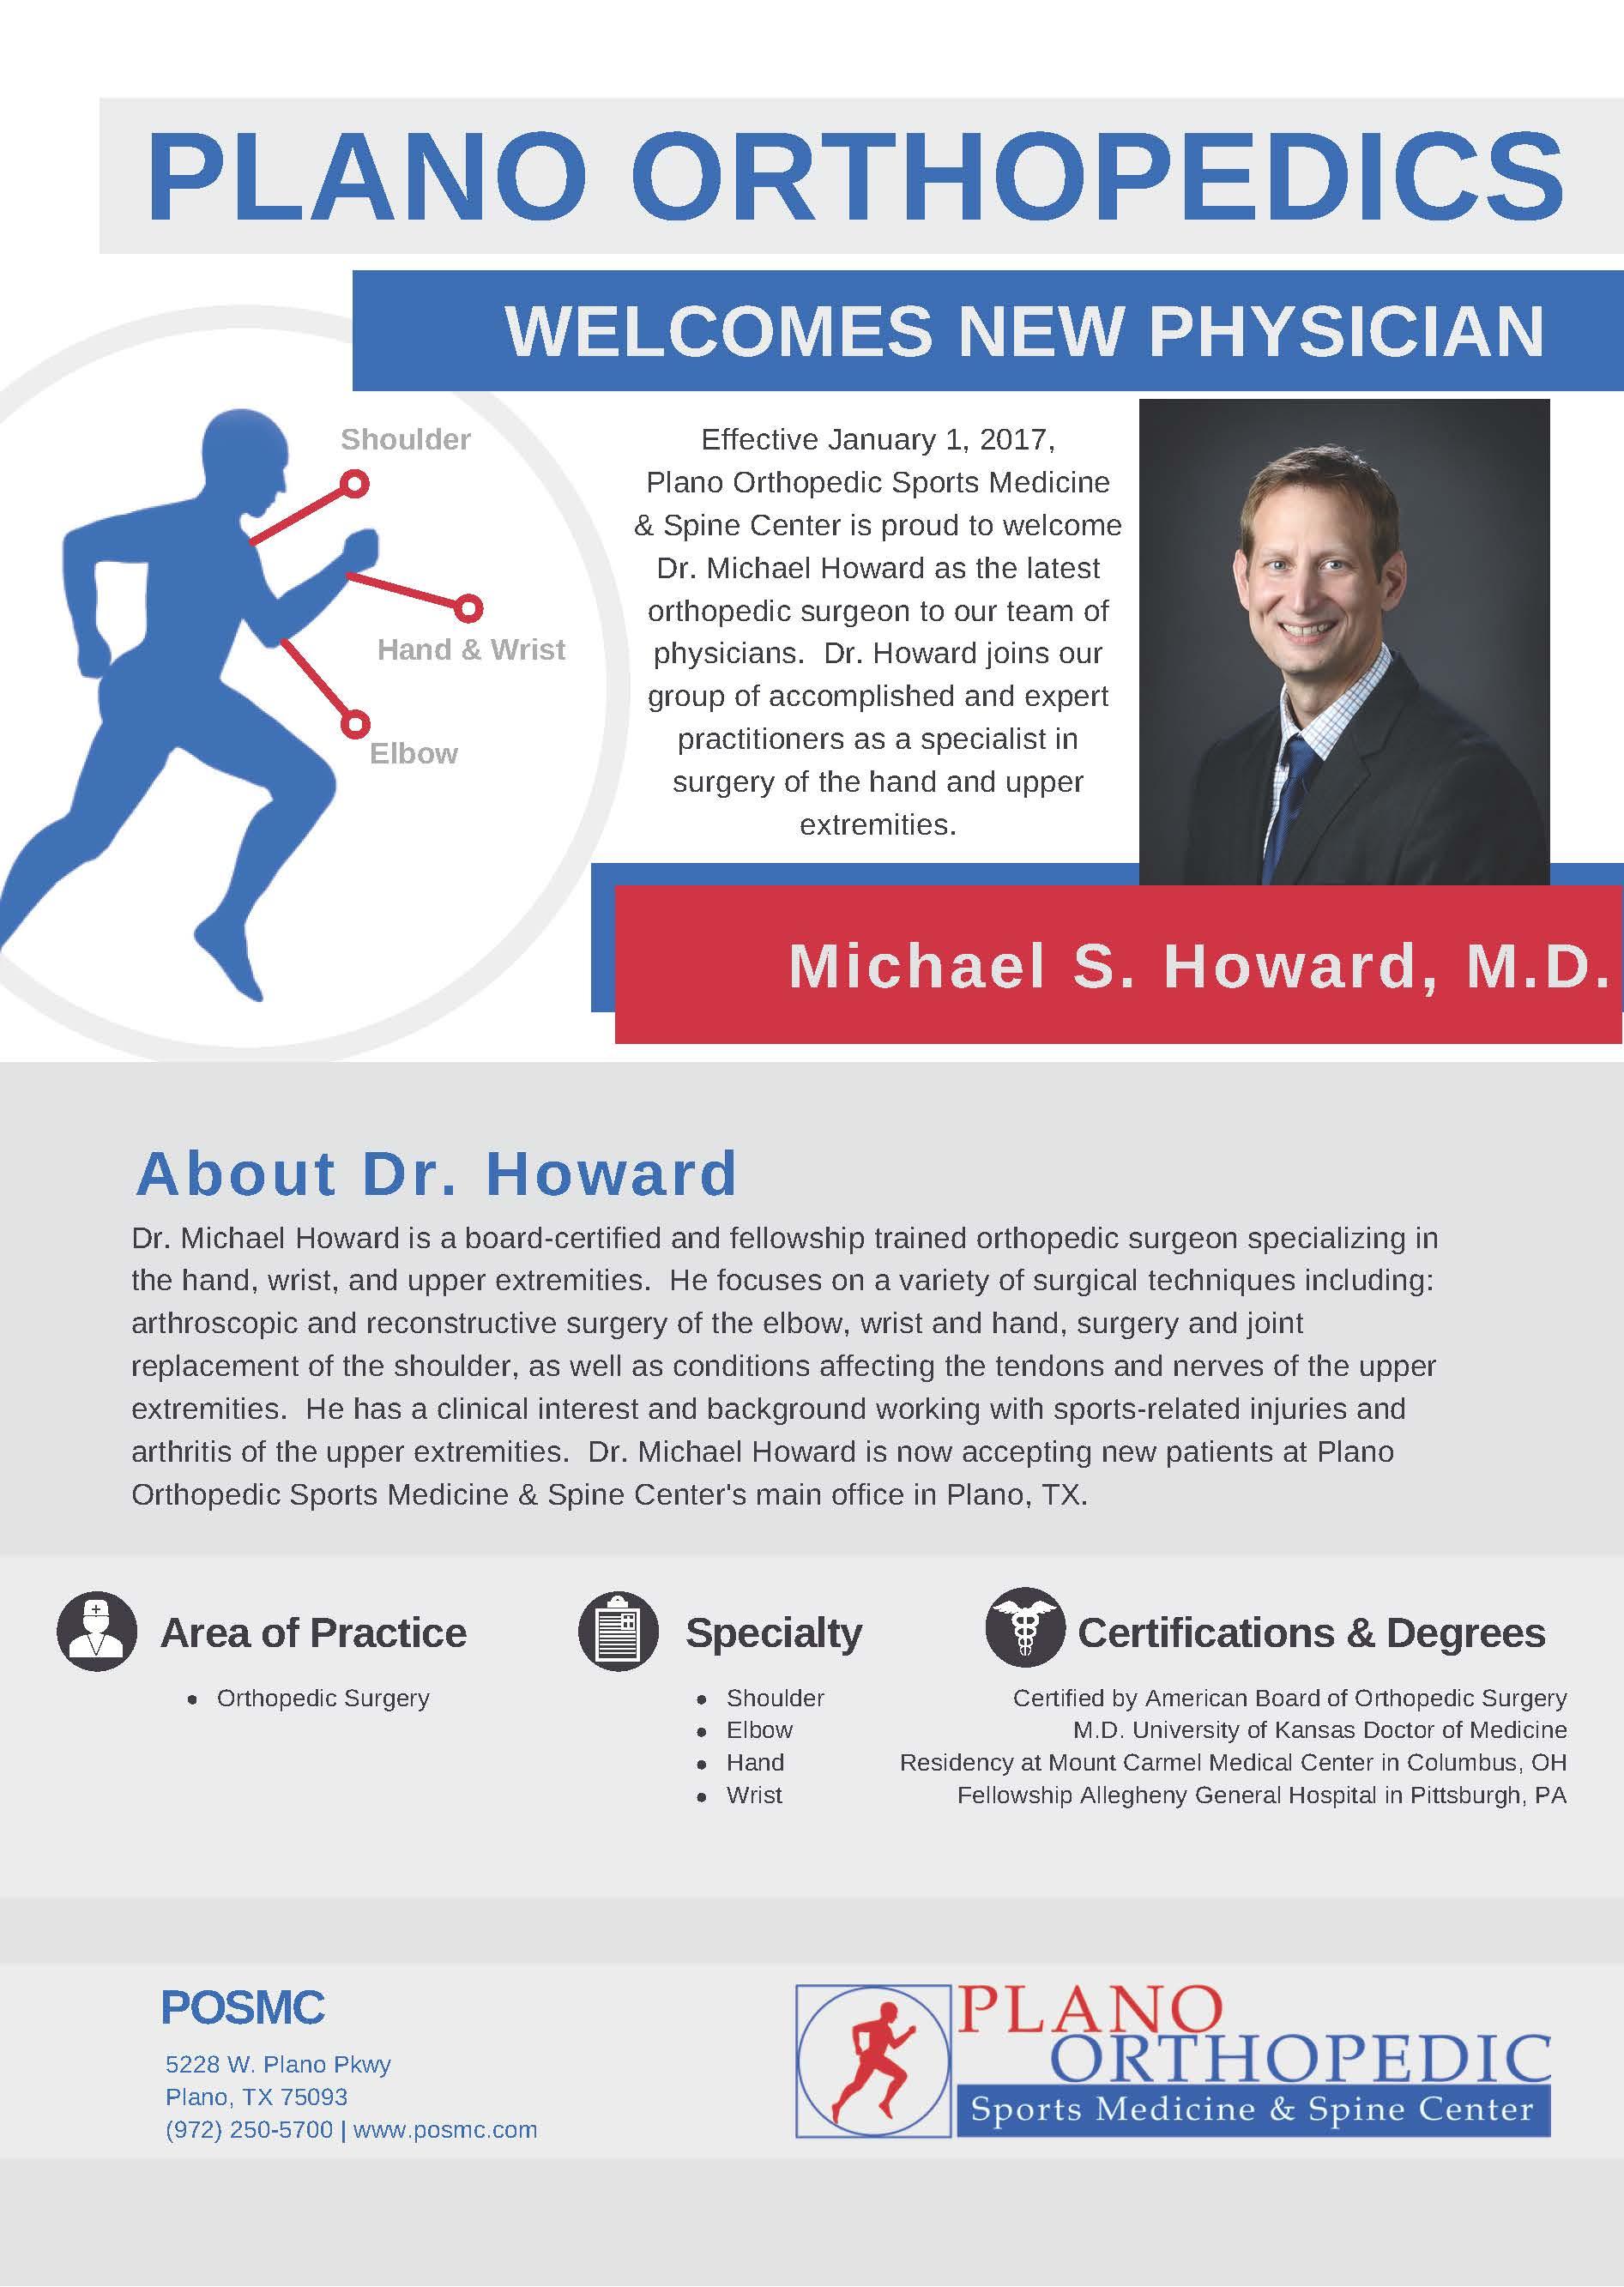 Plano Orthopedics Welcomes New Physician - Plano Orthopedic